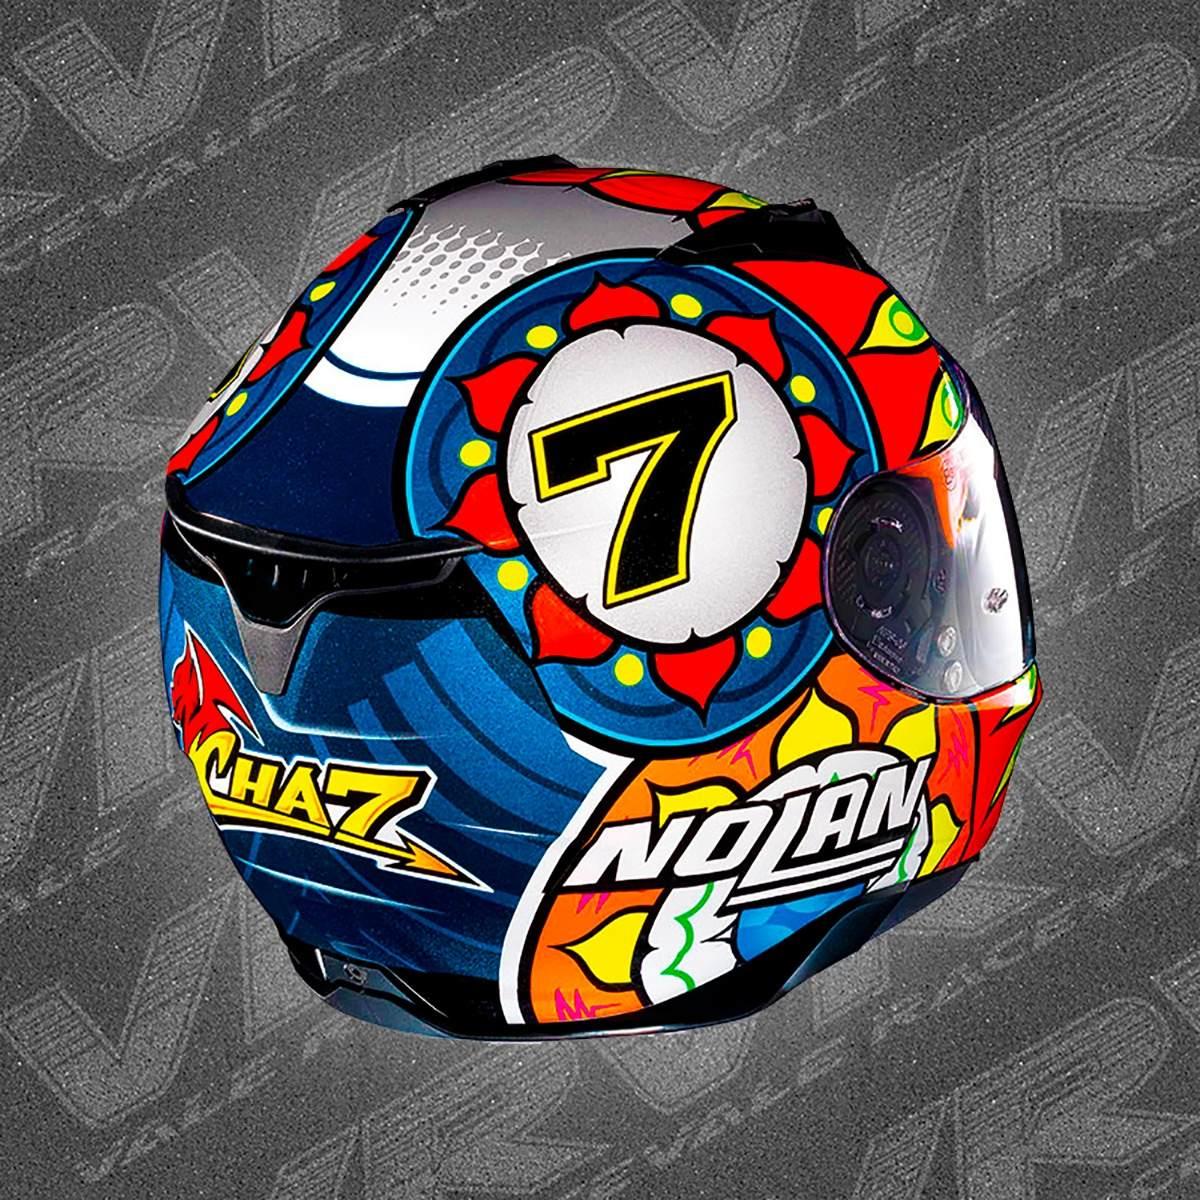 3e61f123f436f capacete nolan n87 chaz davies metal black rapid n-com. Carregando zoom.